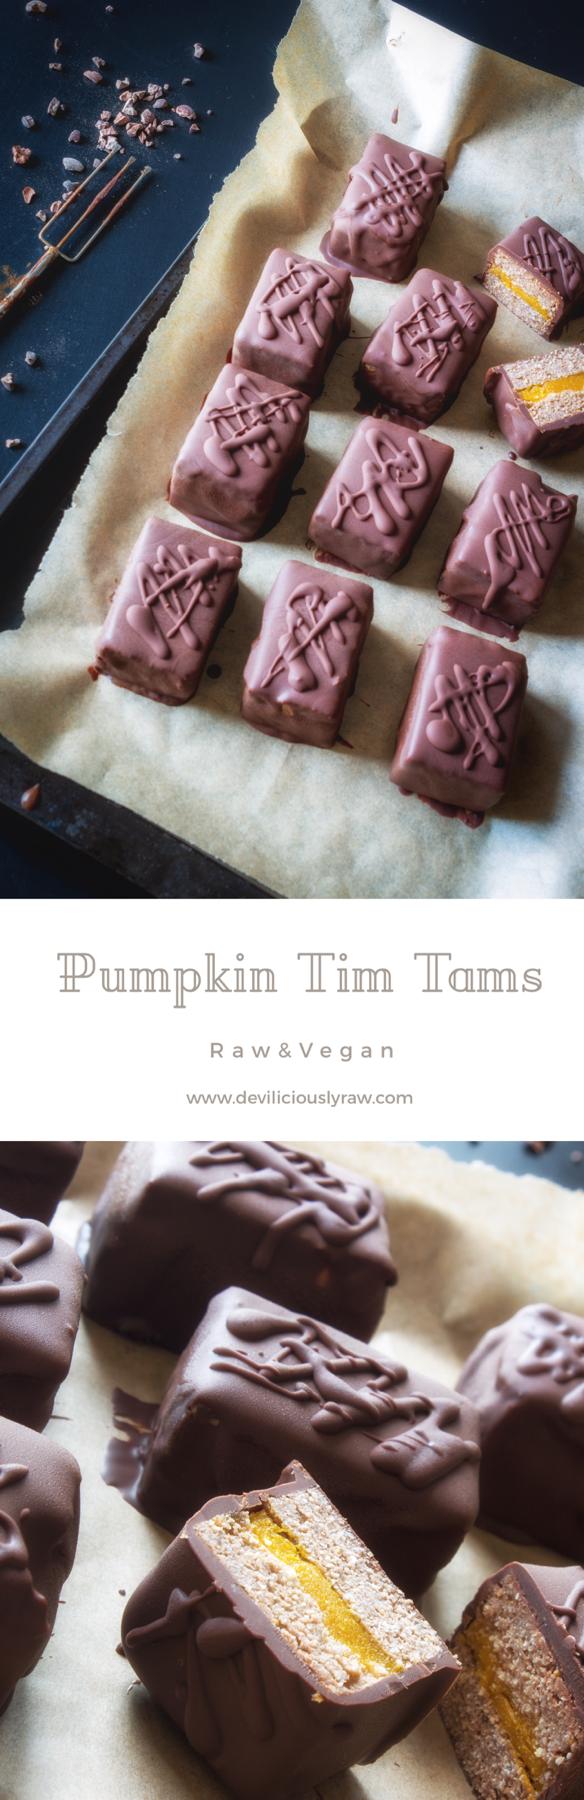 Pumpkin Tim Tams